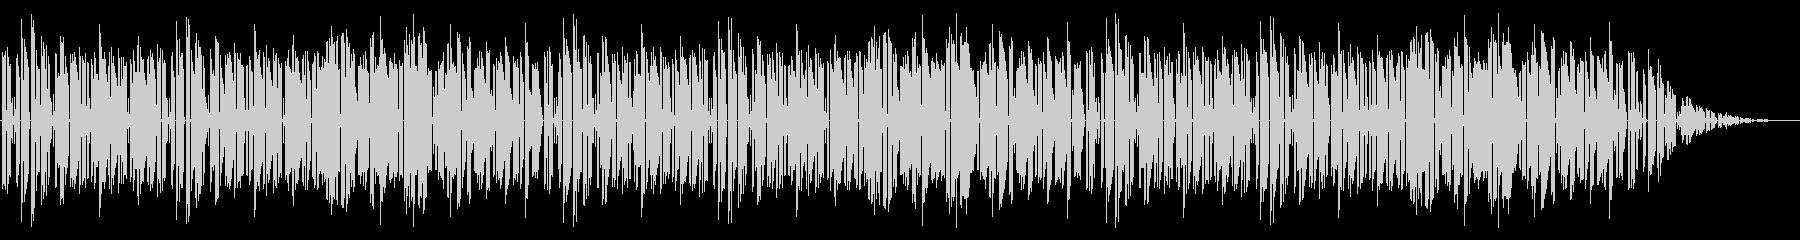 GB風シューティングのステージ曲の未再生の波形